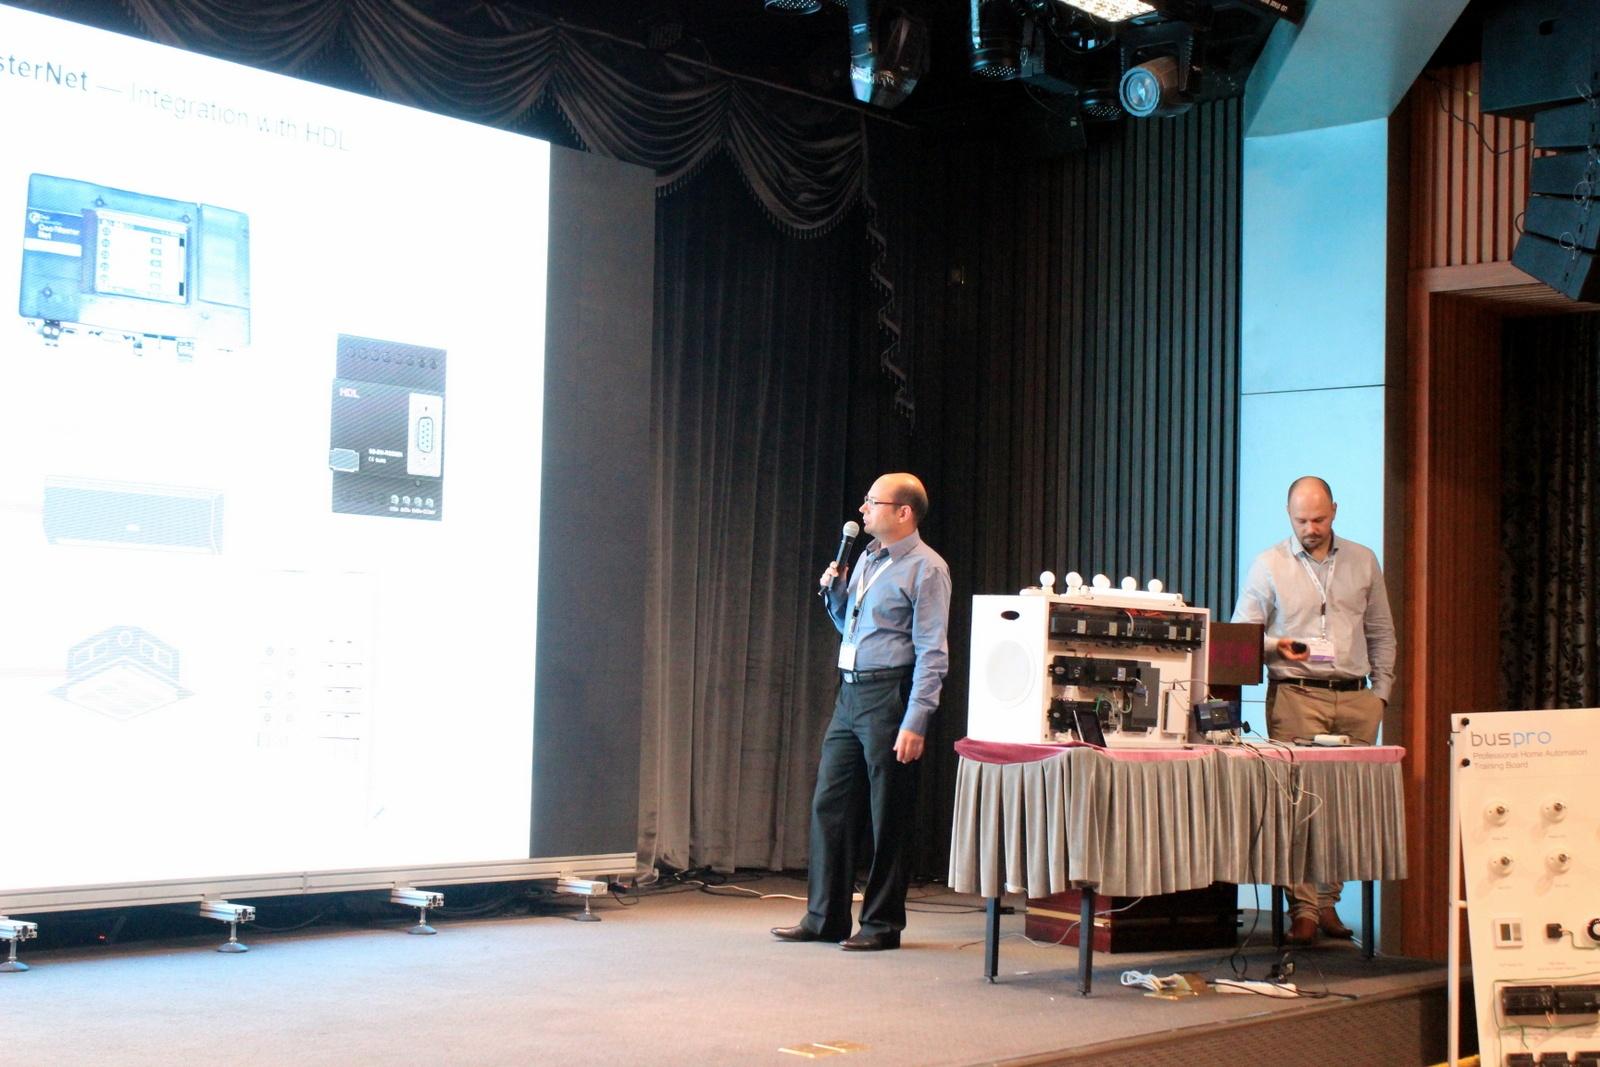 Китай. Завод устройств для «Умного дома». Учимся и учим - 19